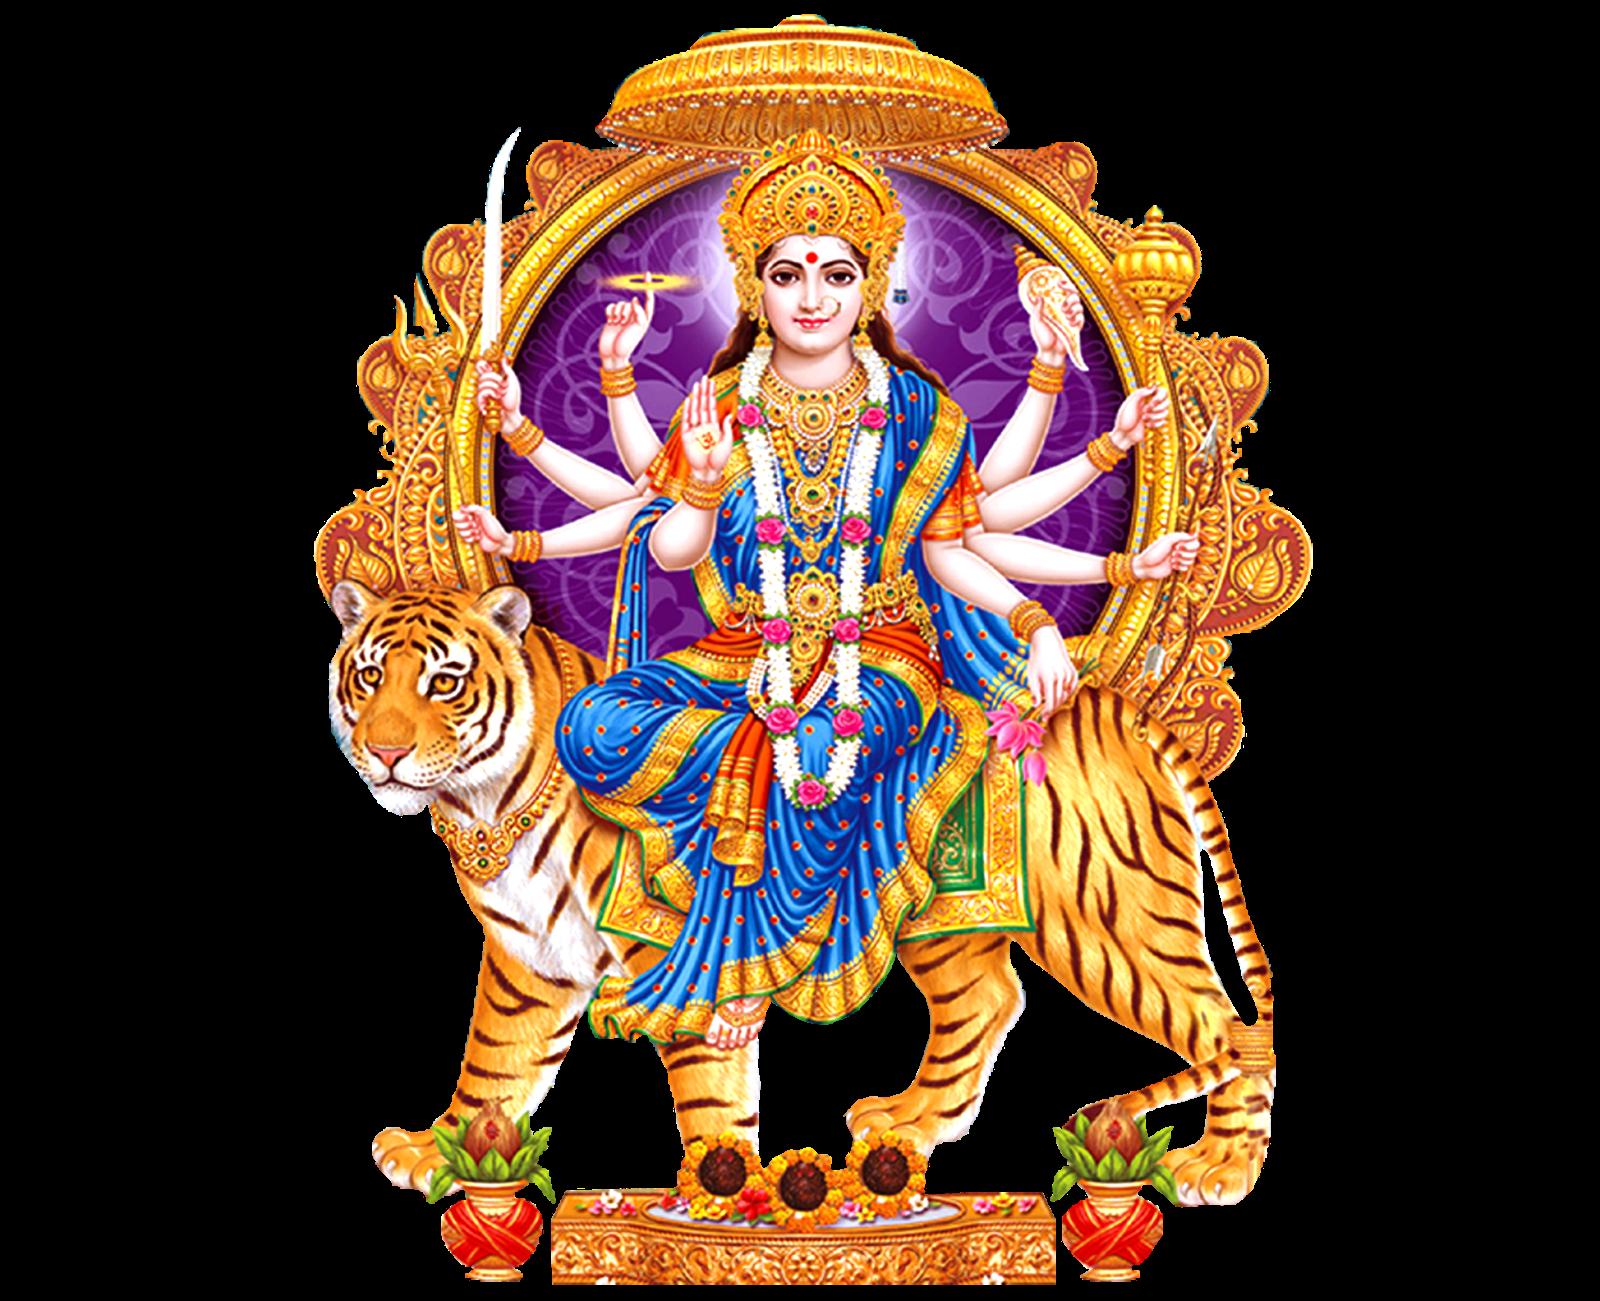 Here Is The Latest Goddess Durga Matha Png Images For Designs Indian Goddess  Durga Png Vector - Hindu God PNG HD